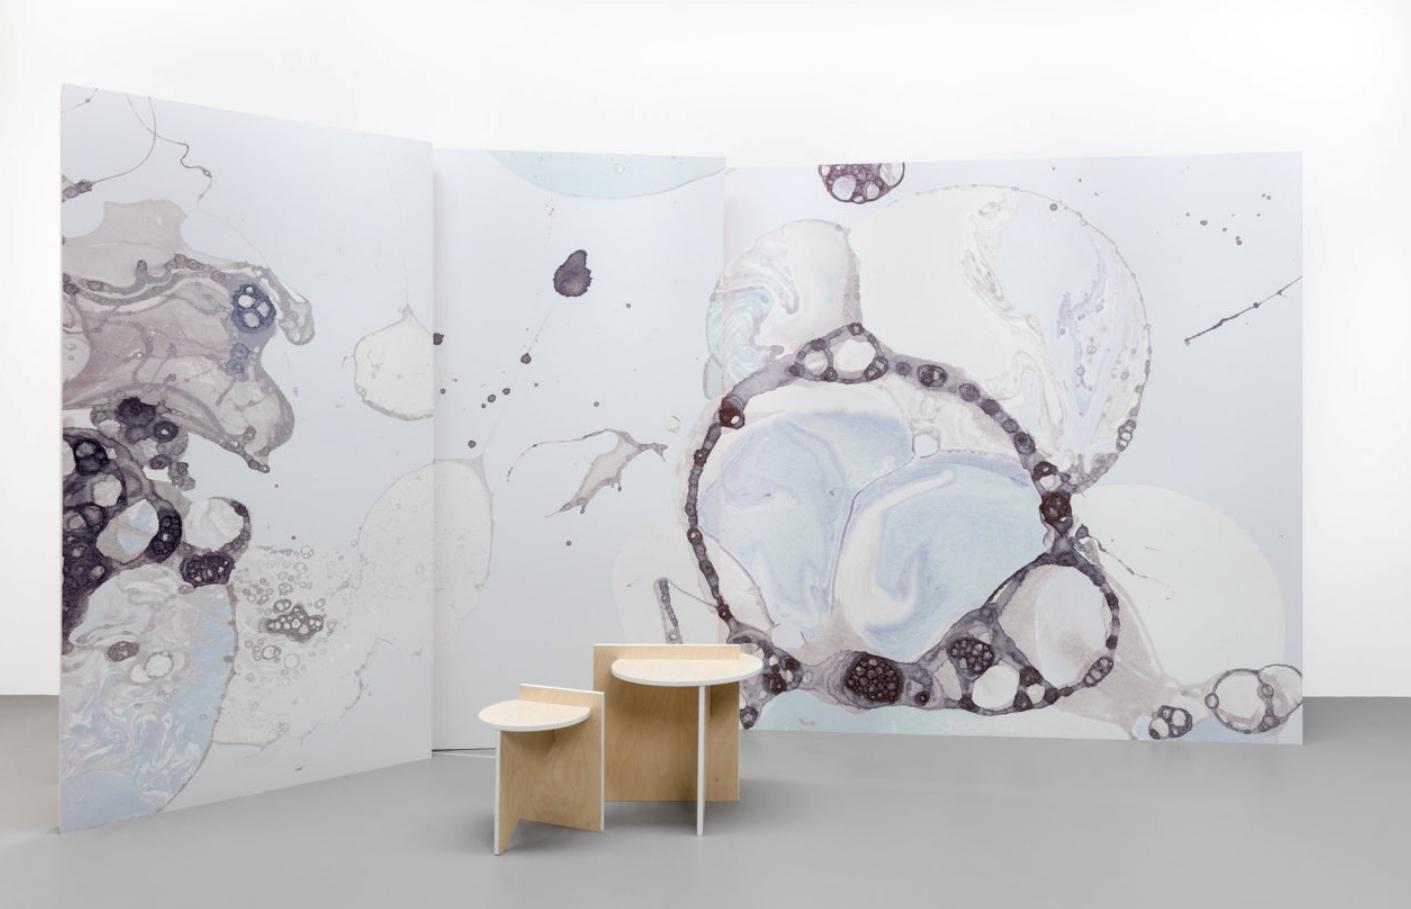 Gradients, metallics, ombre, woven fibers recreate fantastic wallpaper that will excite anyone